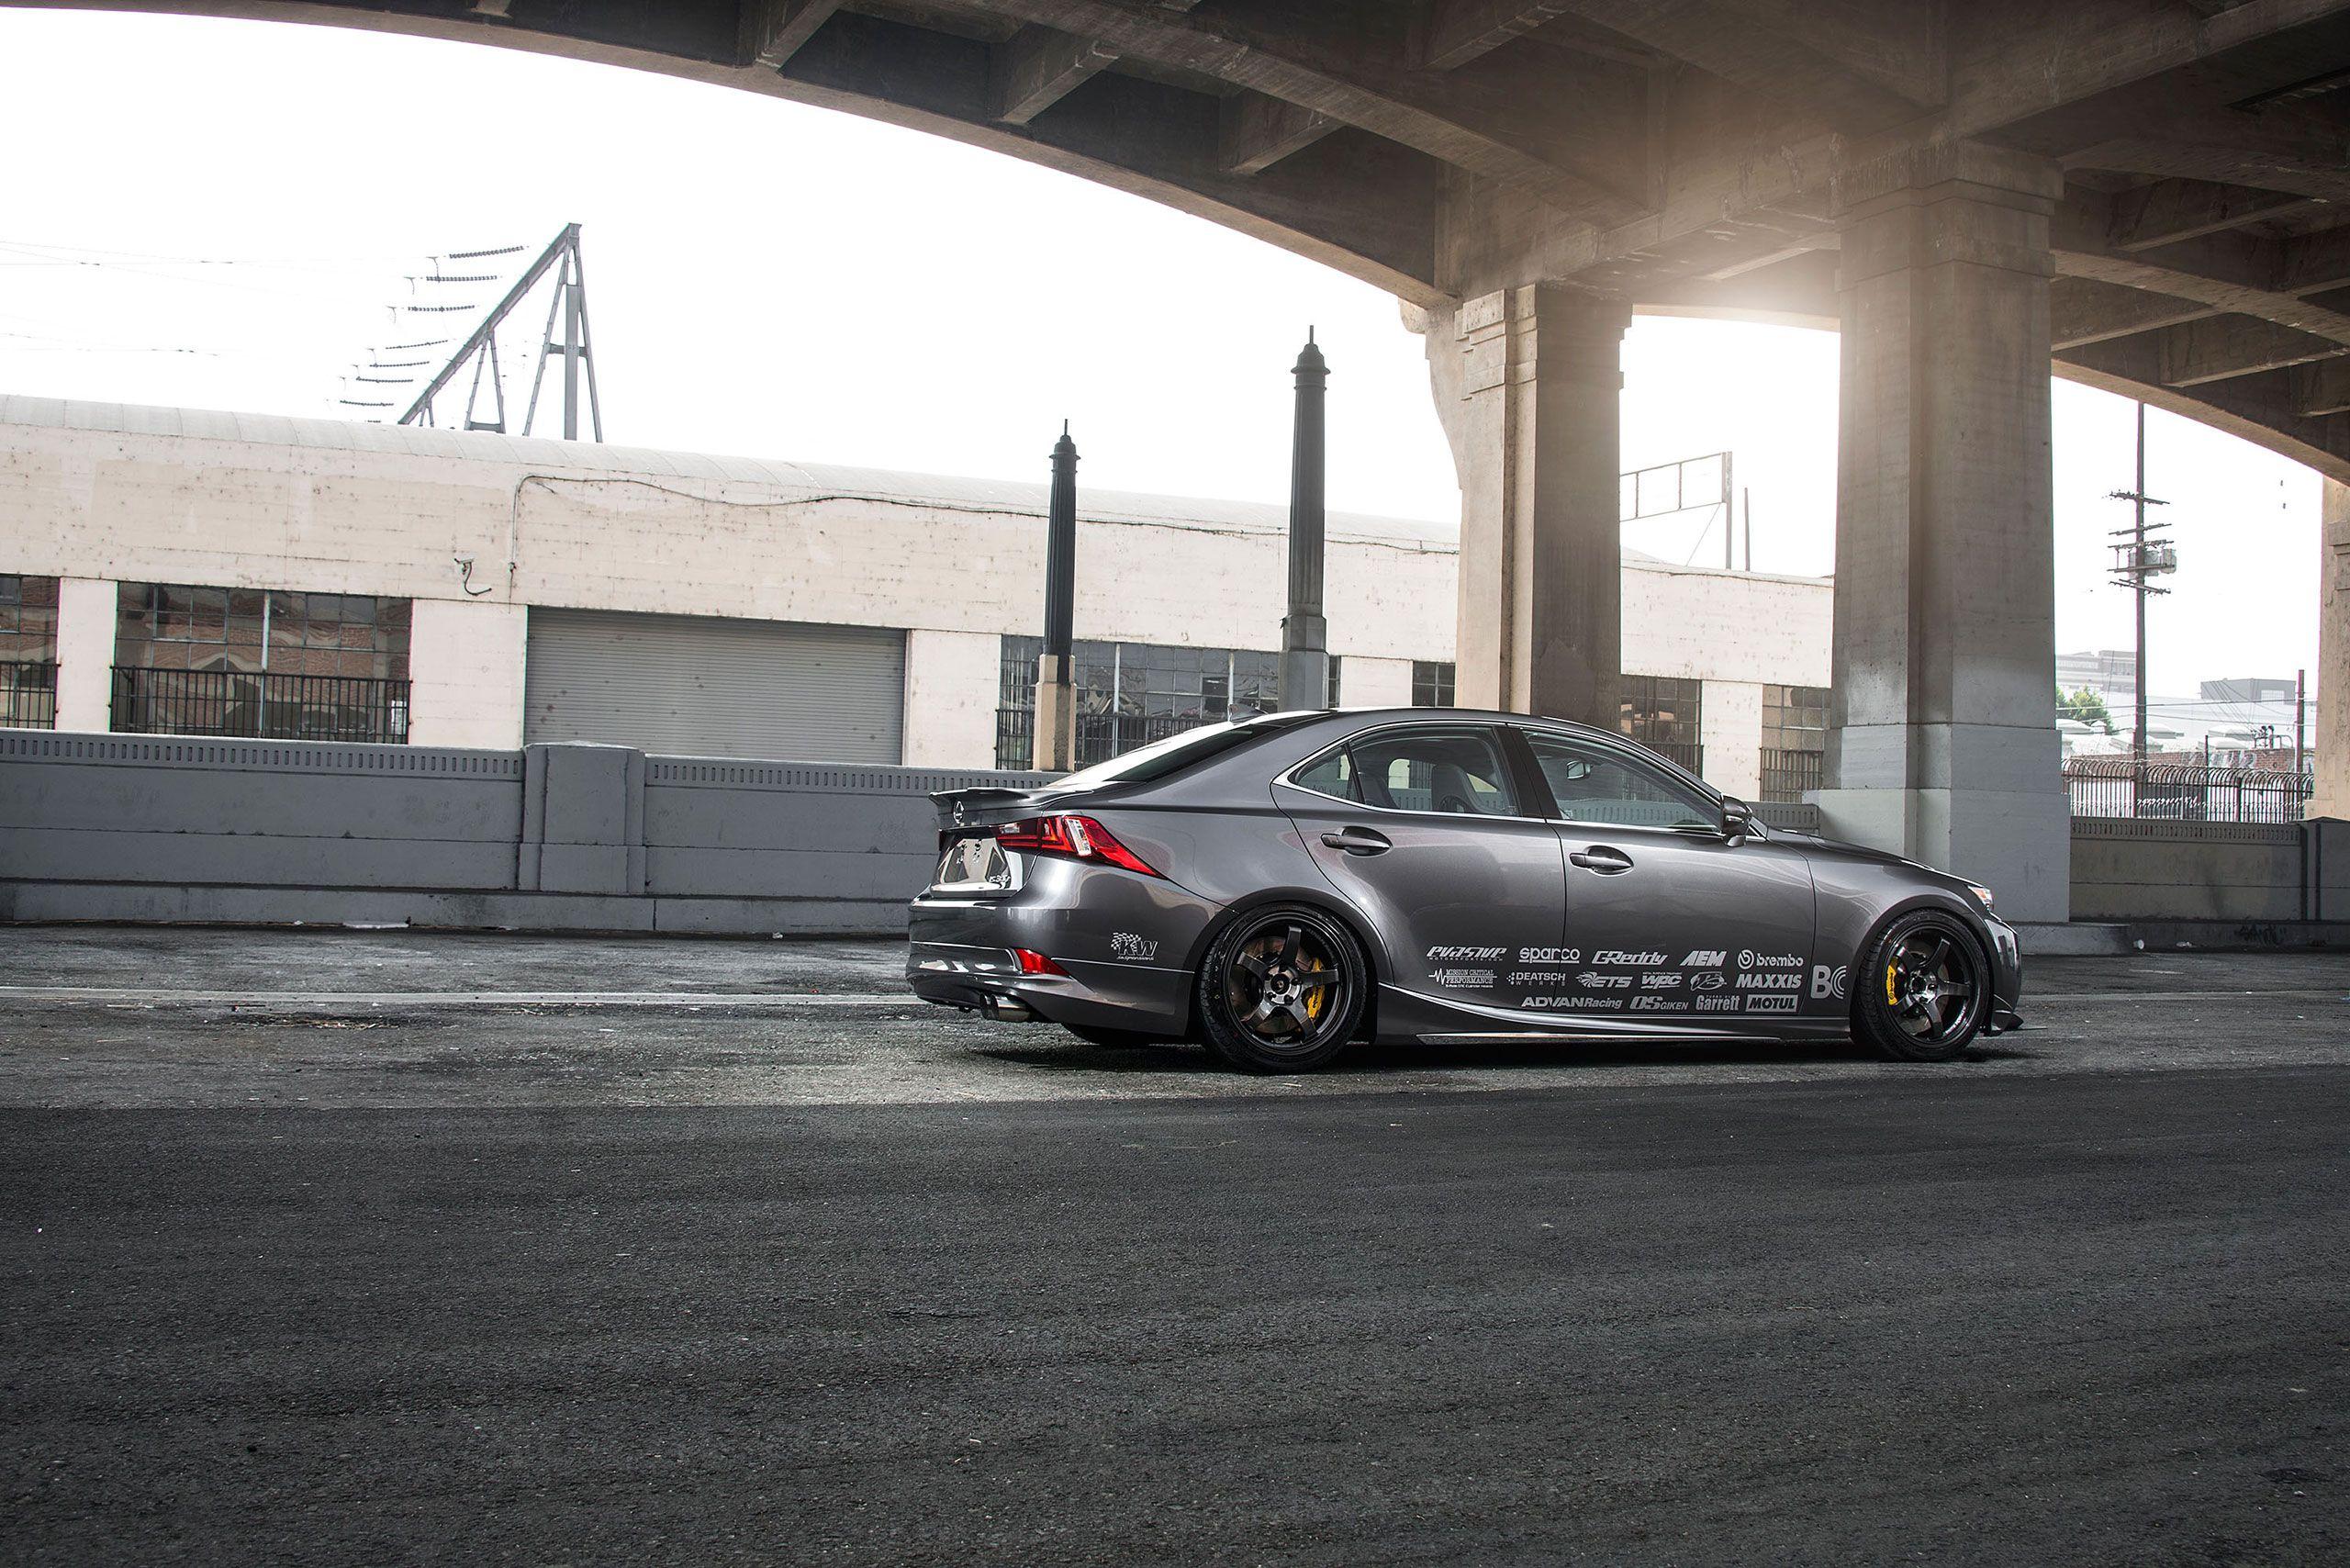 2014 Lexus Is 350 F Sport Seibon Carbon Wallpaper Lexus 2014 350 Carbon F Is Lexus Seibon Sport Http Wallau Lexus Car Brands Car Photos